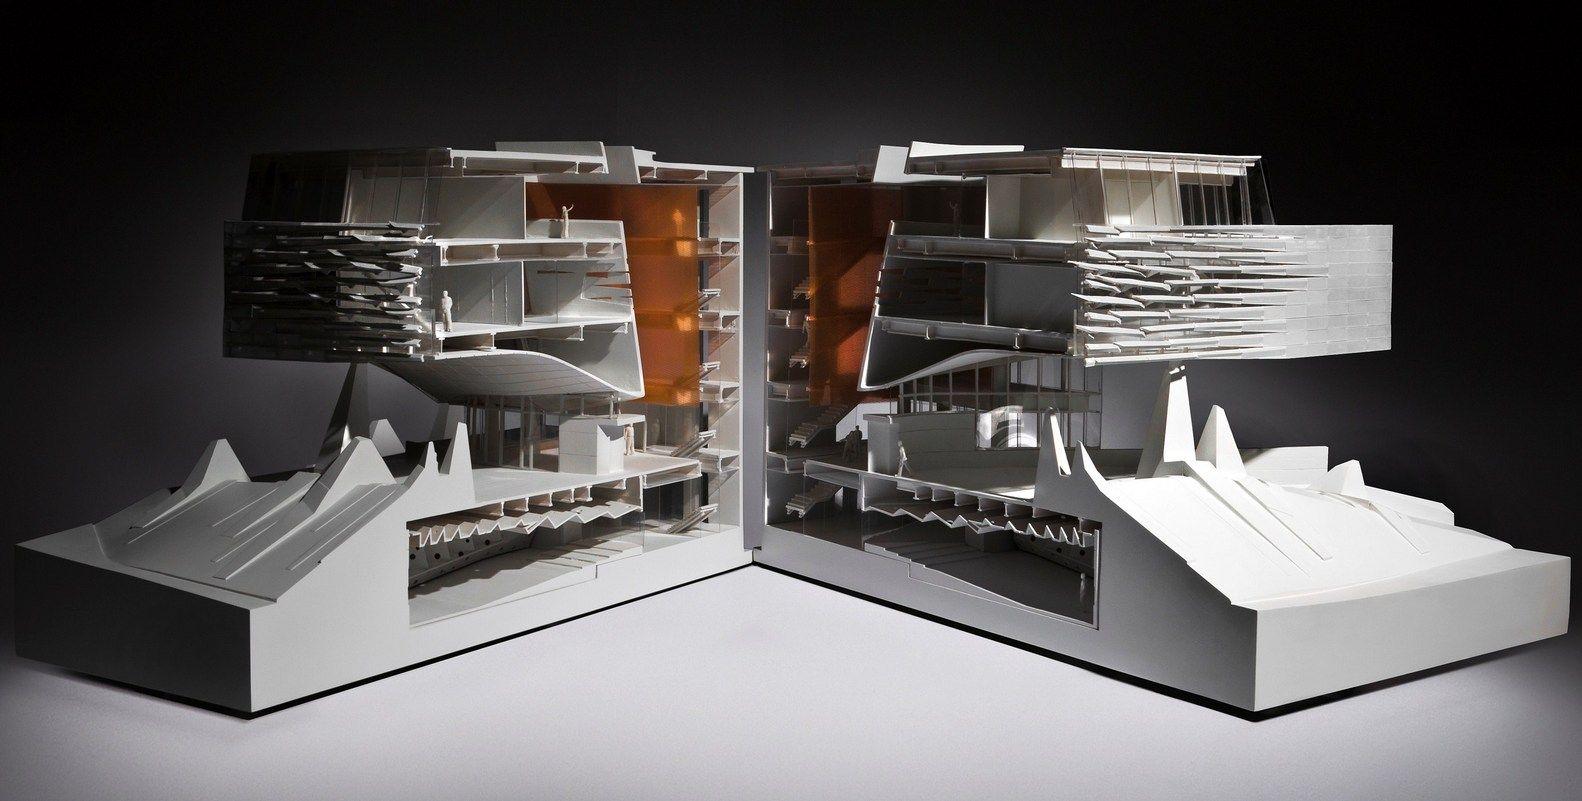 High Quality Architekturmodell, Diagramm, Kronen, Modellbau, Architektur Student,  Architektonische Modelle, Innenarchitektur, Modernes Architekturdesign, ...